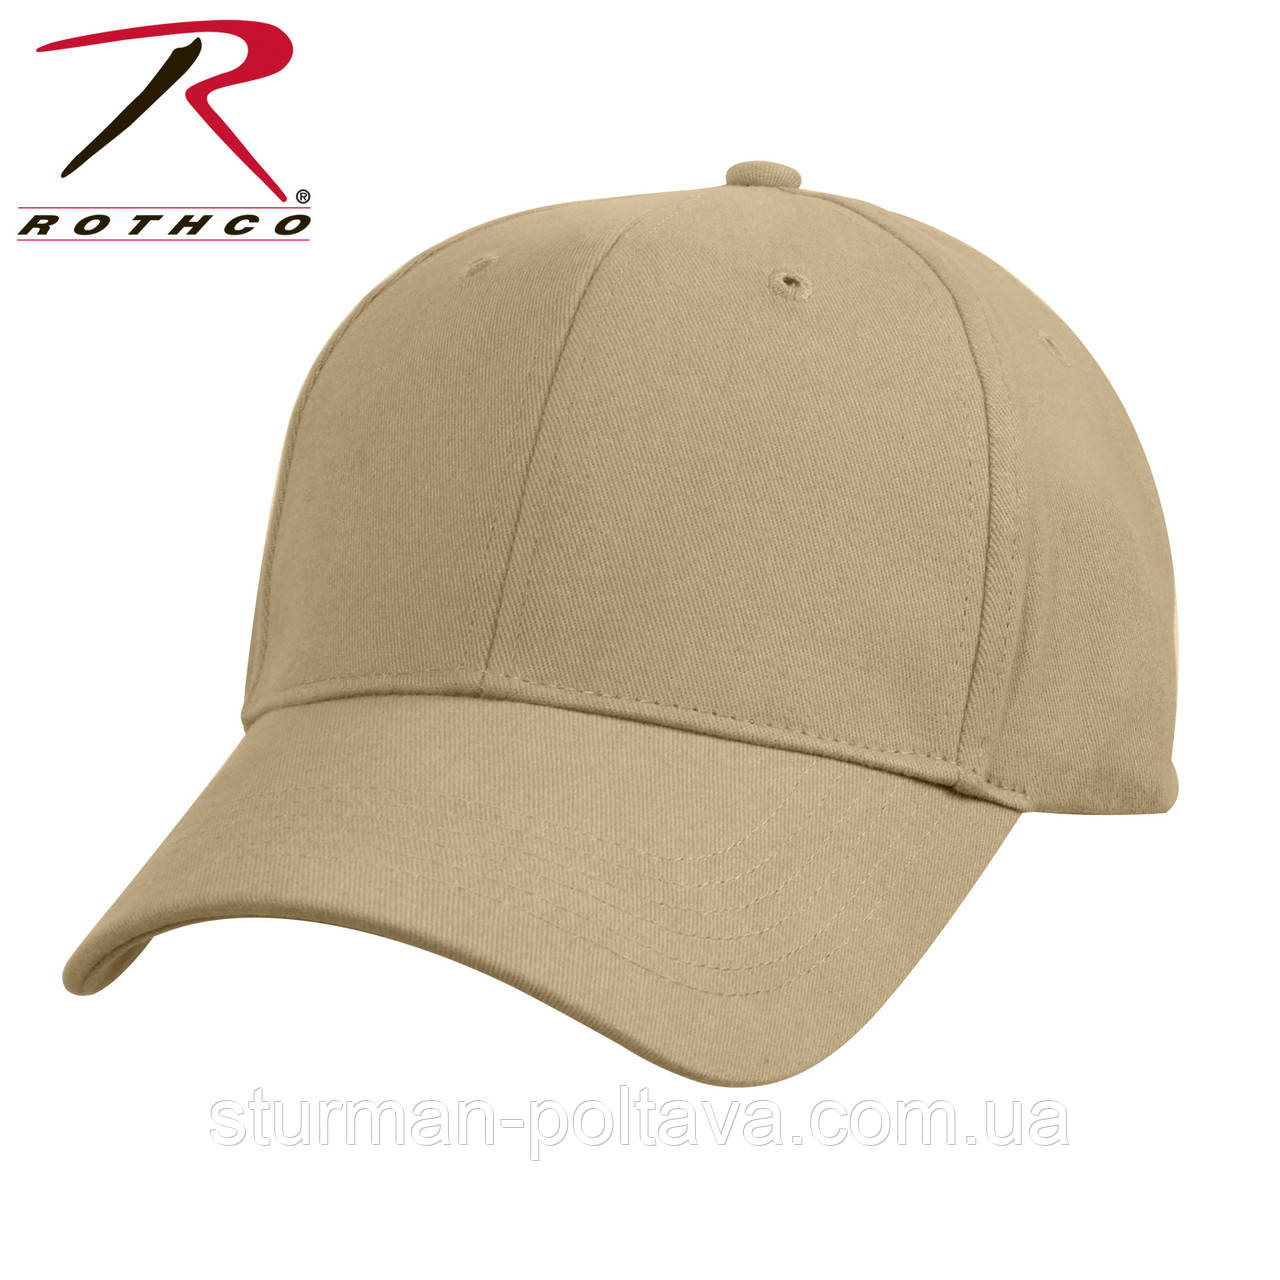 Бейсболка чоловіча бежева Rothco Supreme Solid Color Low Profile Cap бавовна 100% твіл Rothco